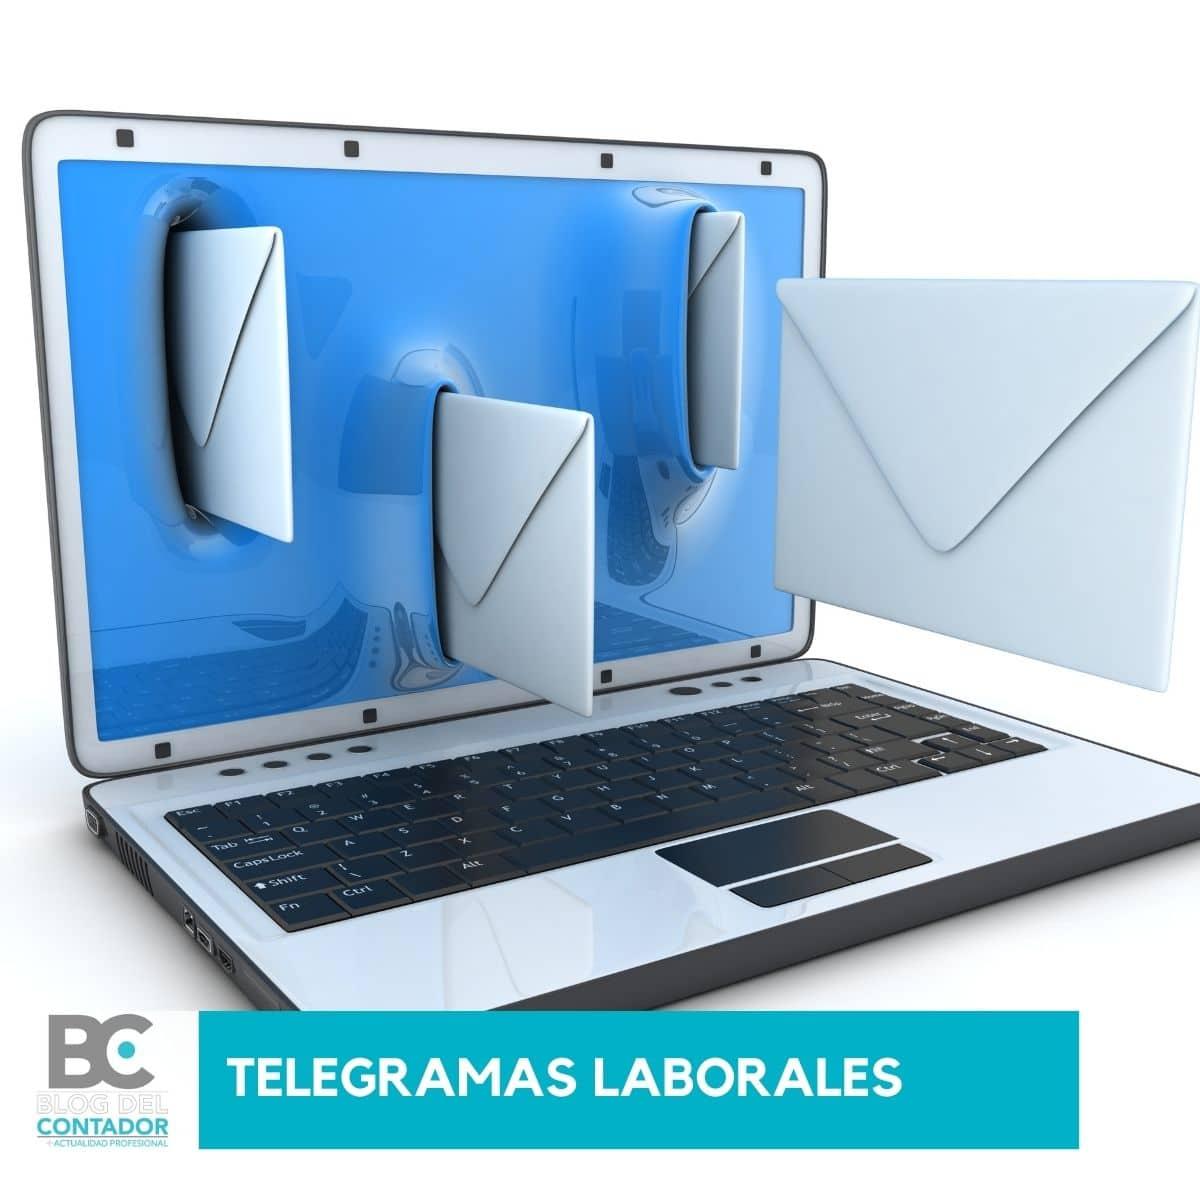 telegramas laborales